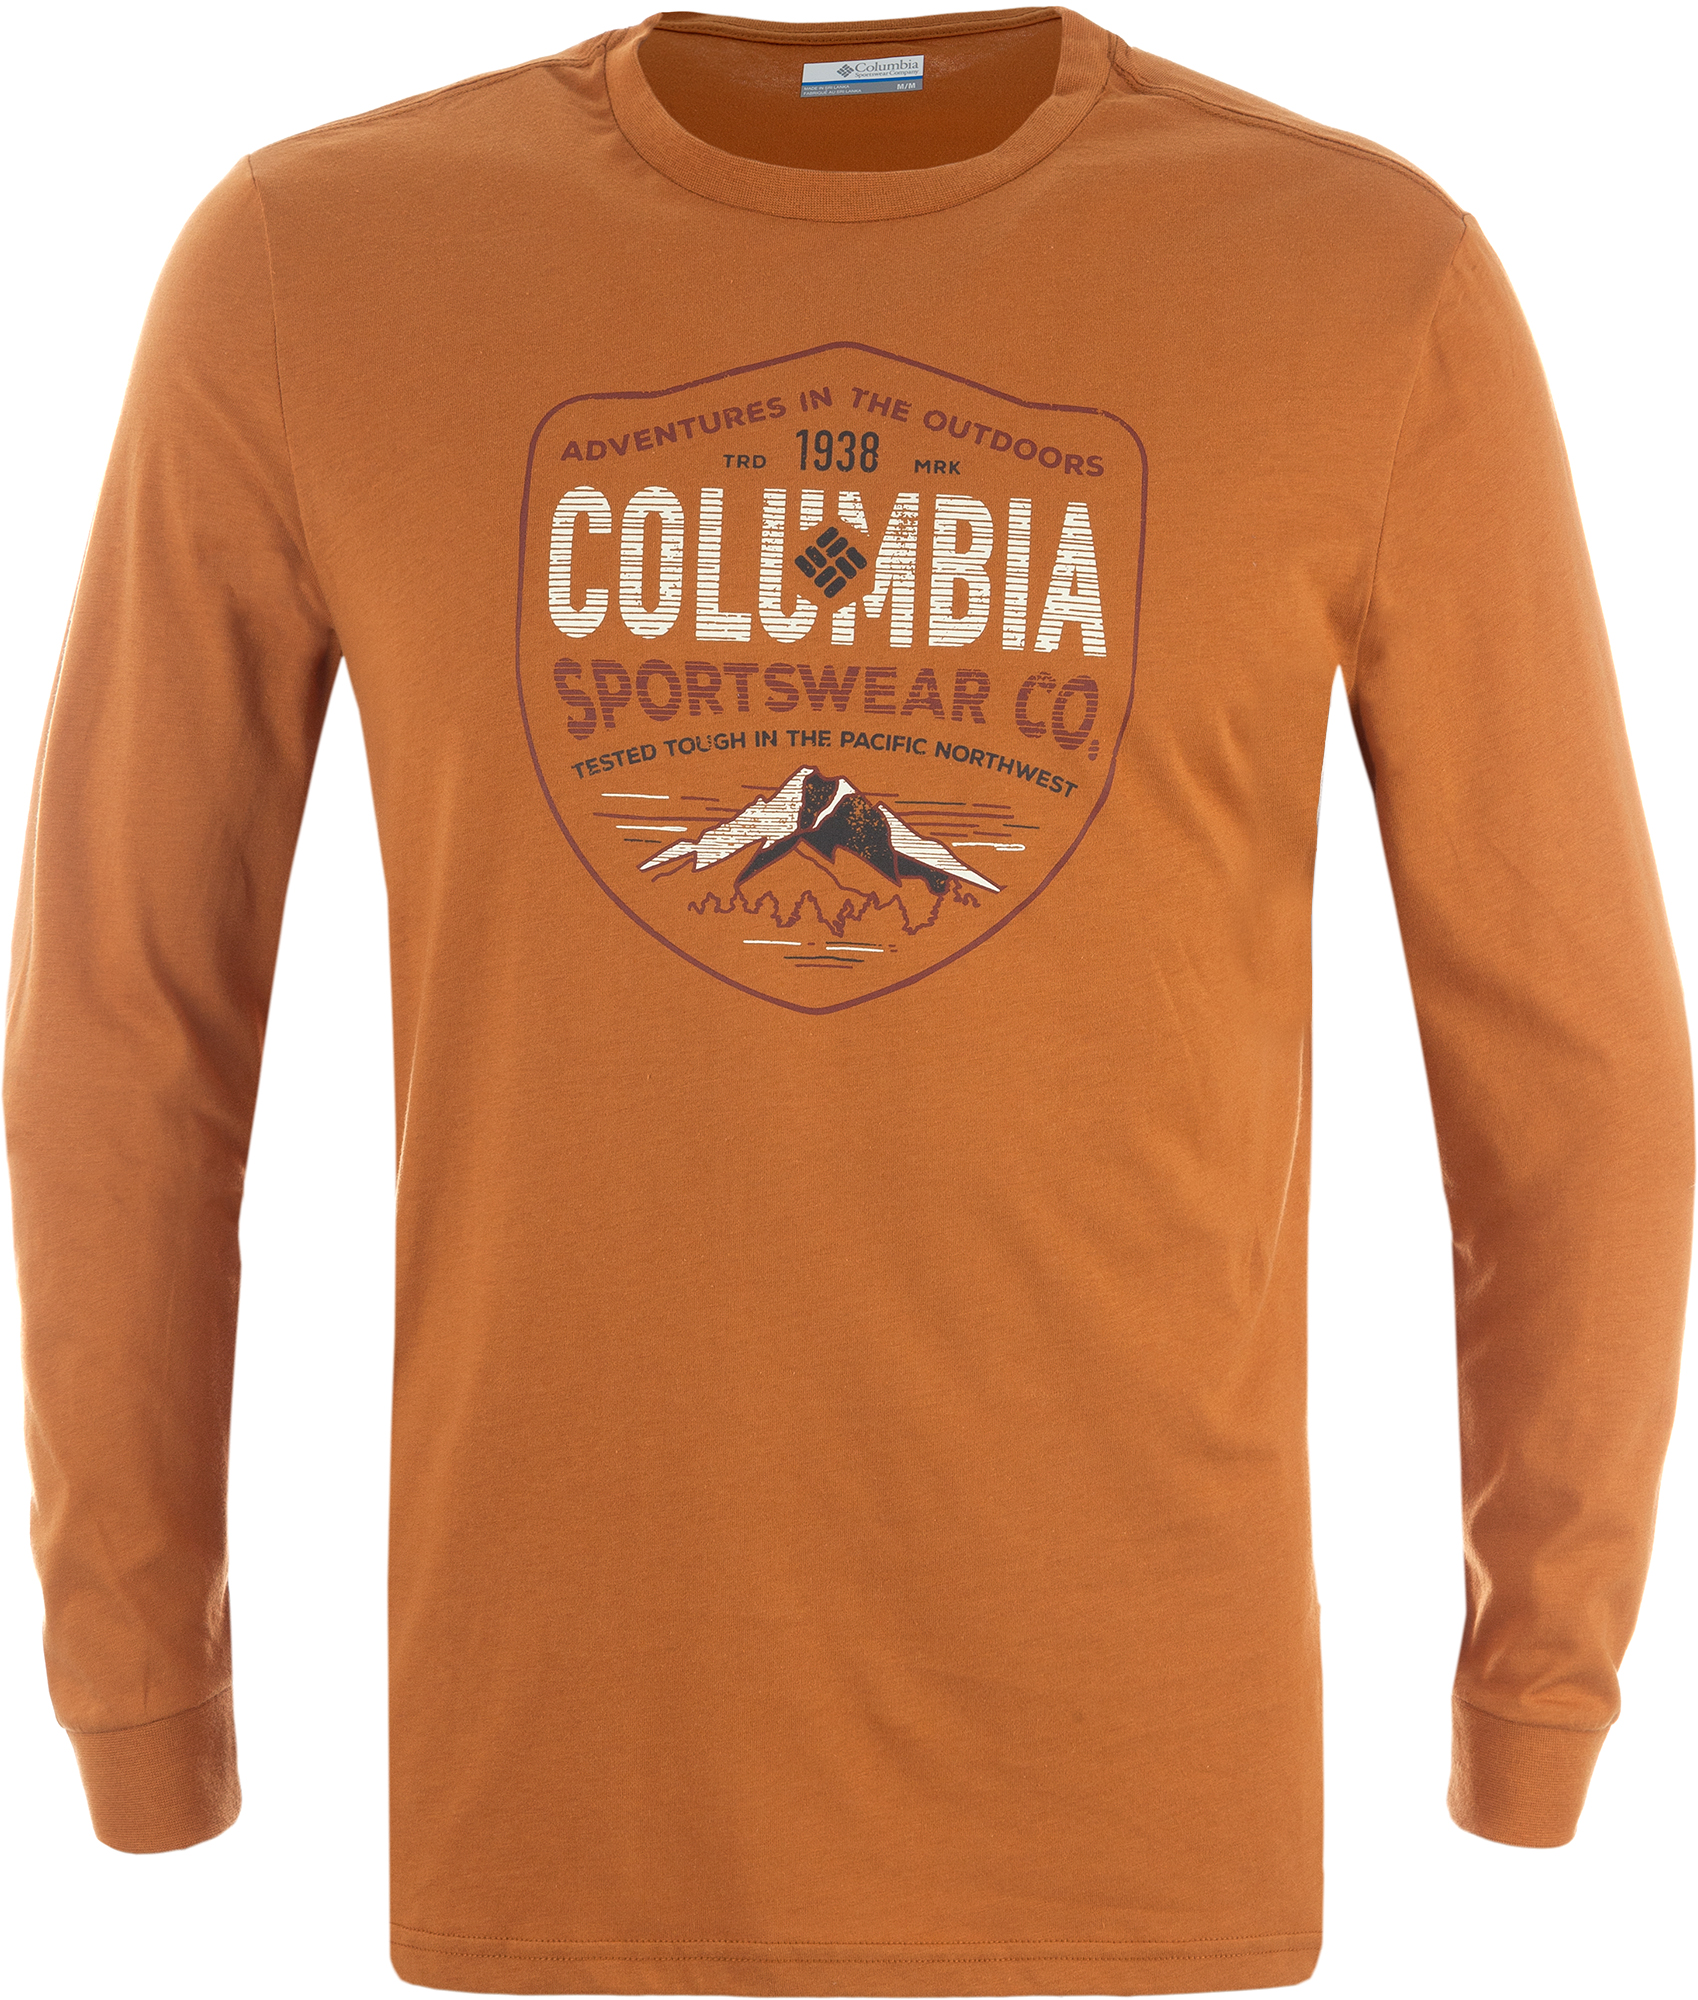 Columbia Футболка с длинным рукавом мужская Columbia Rugged Shield columbia рубашка с длинным рукавом мужская columbia boulder ridge